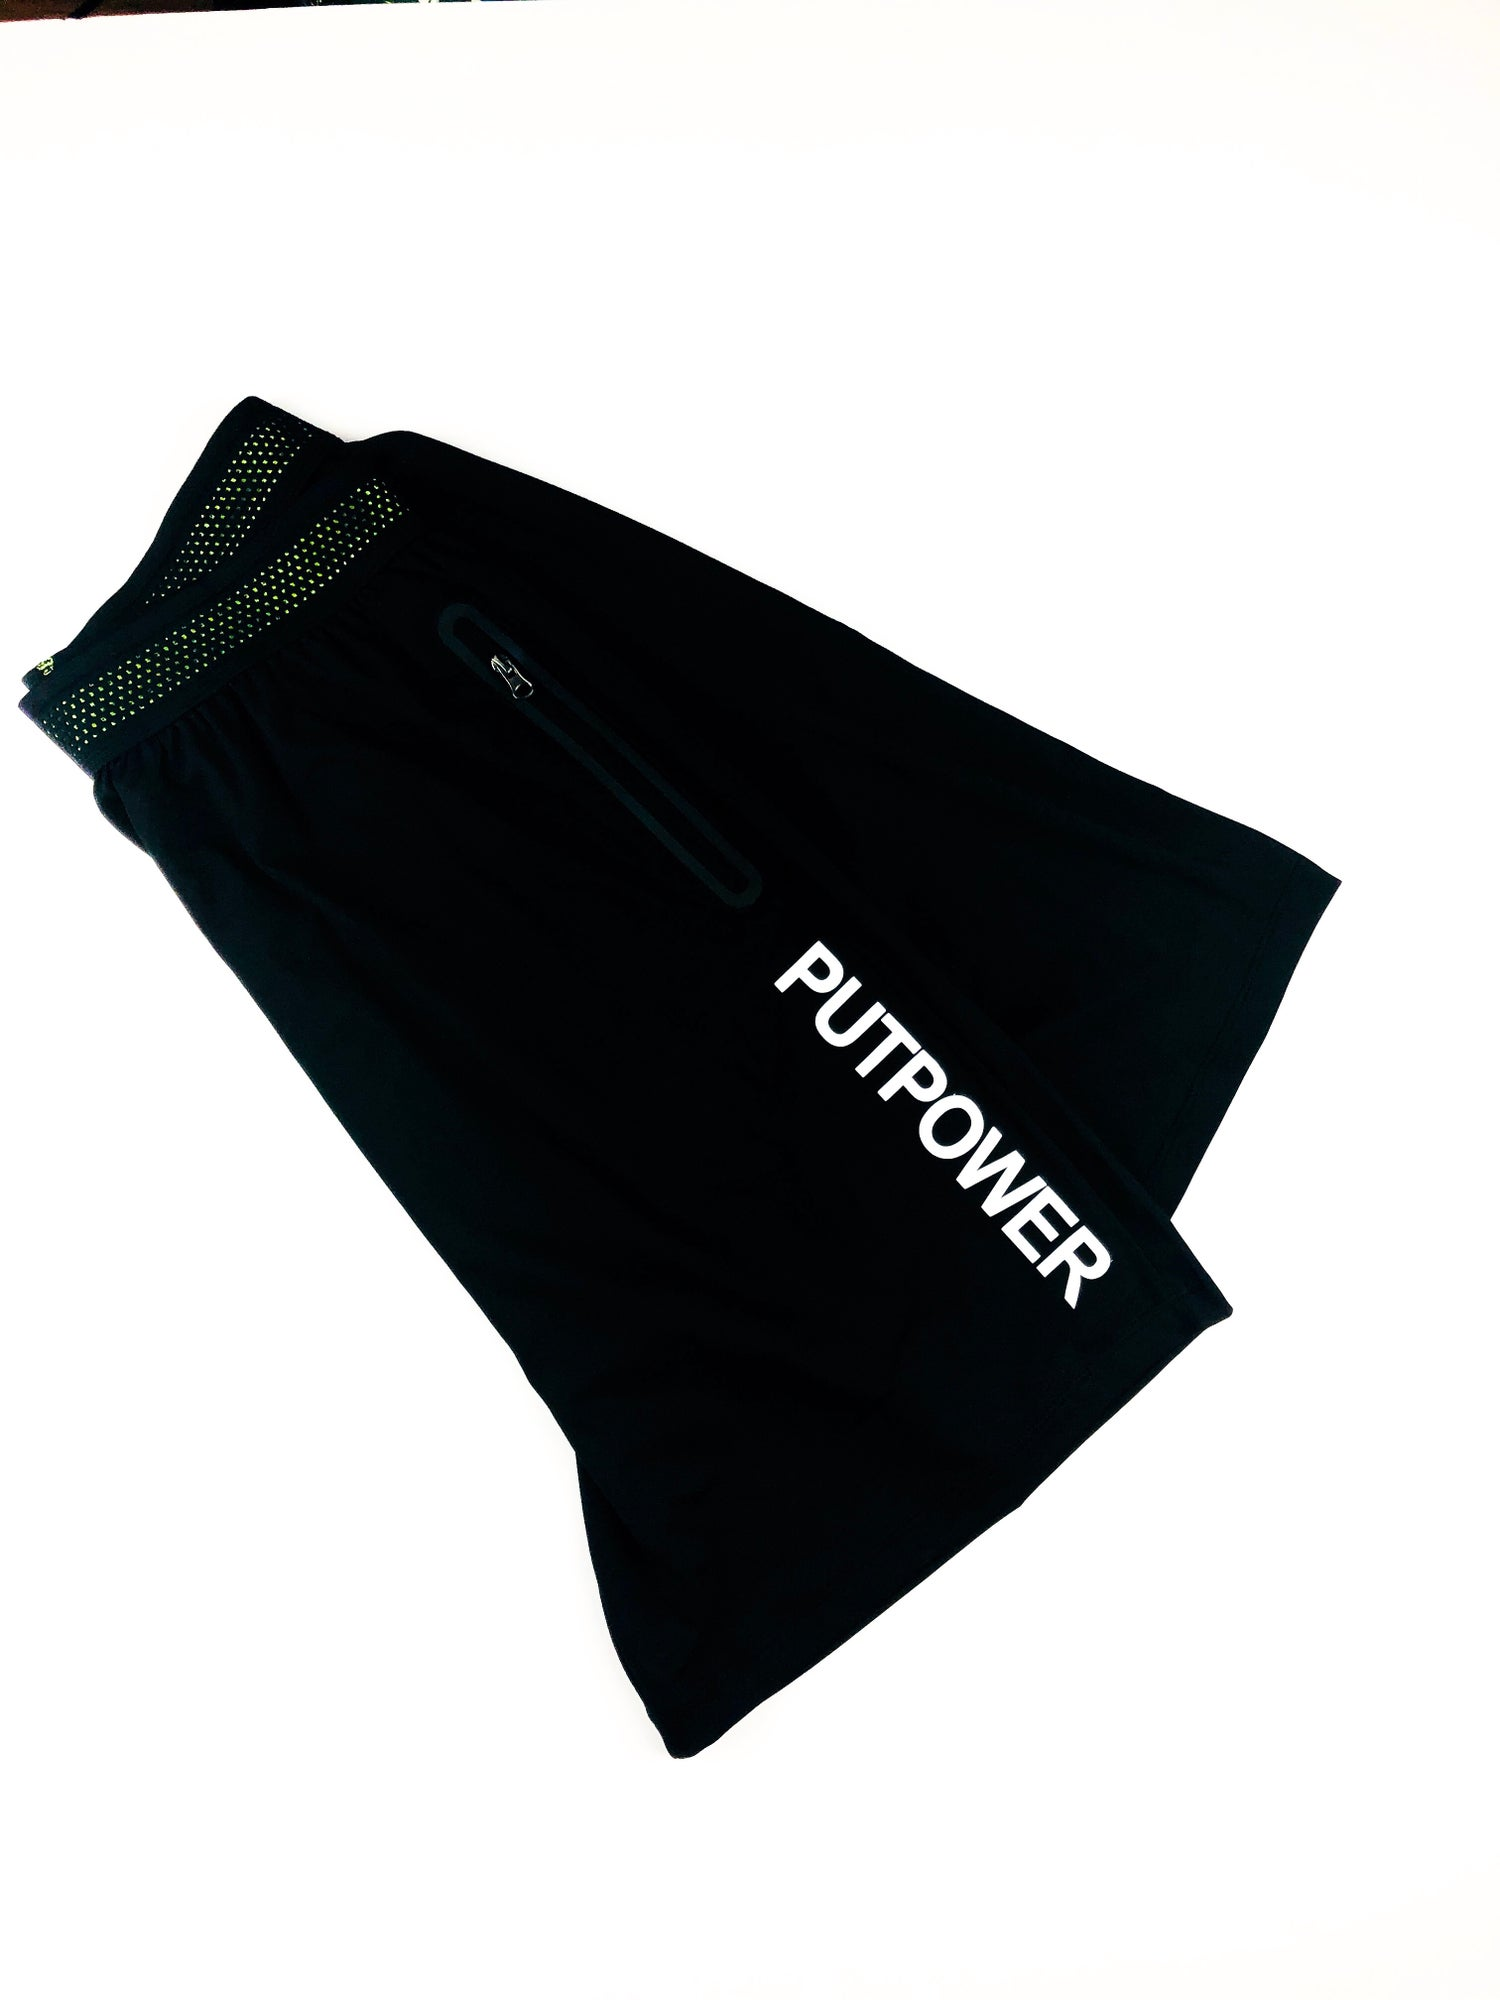 Image of PUTPOWER REFLECTIVE SHORTS